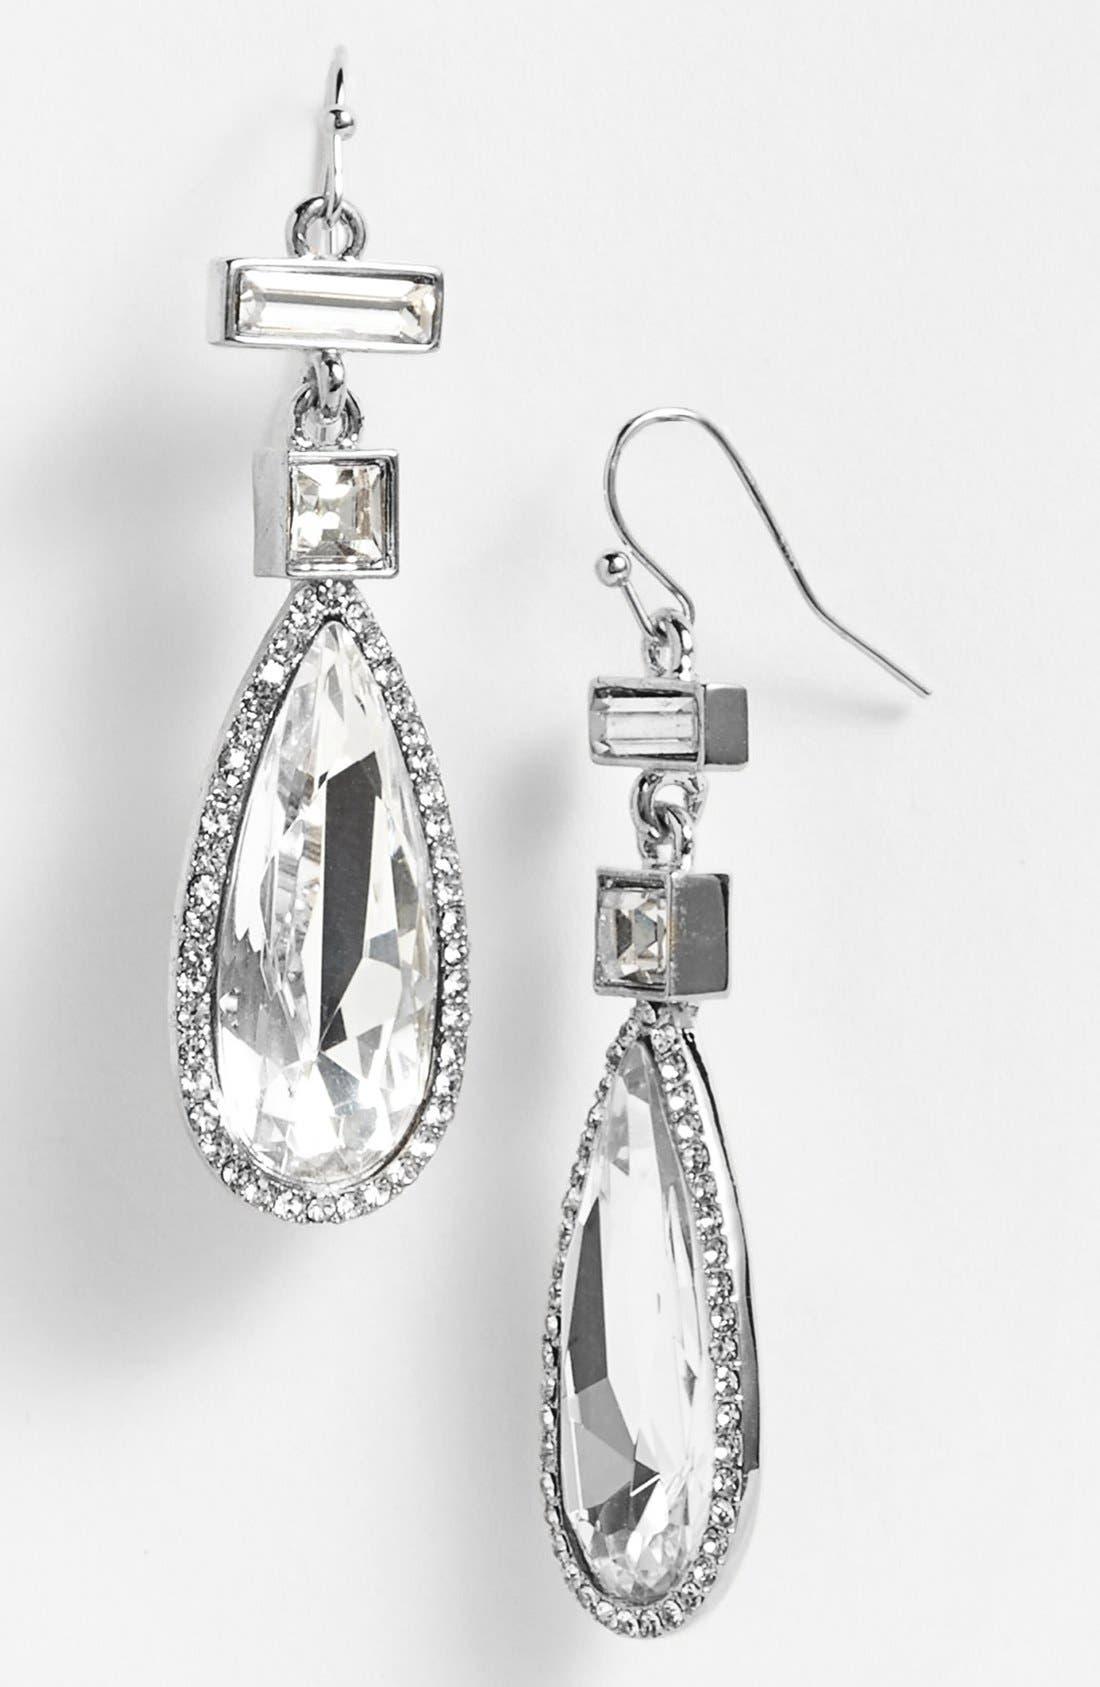 Main Image - Vince Camuto 'Diamonds in the Sky' Crystal Teardrop Earrings